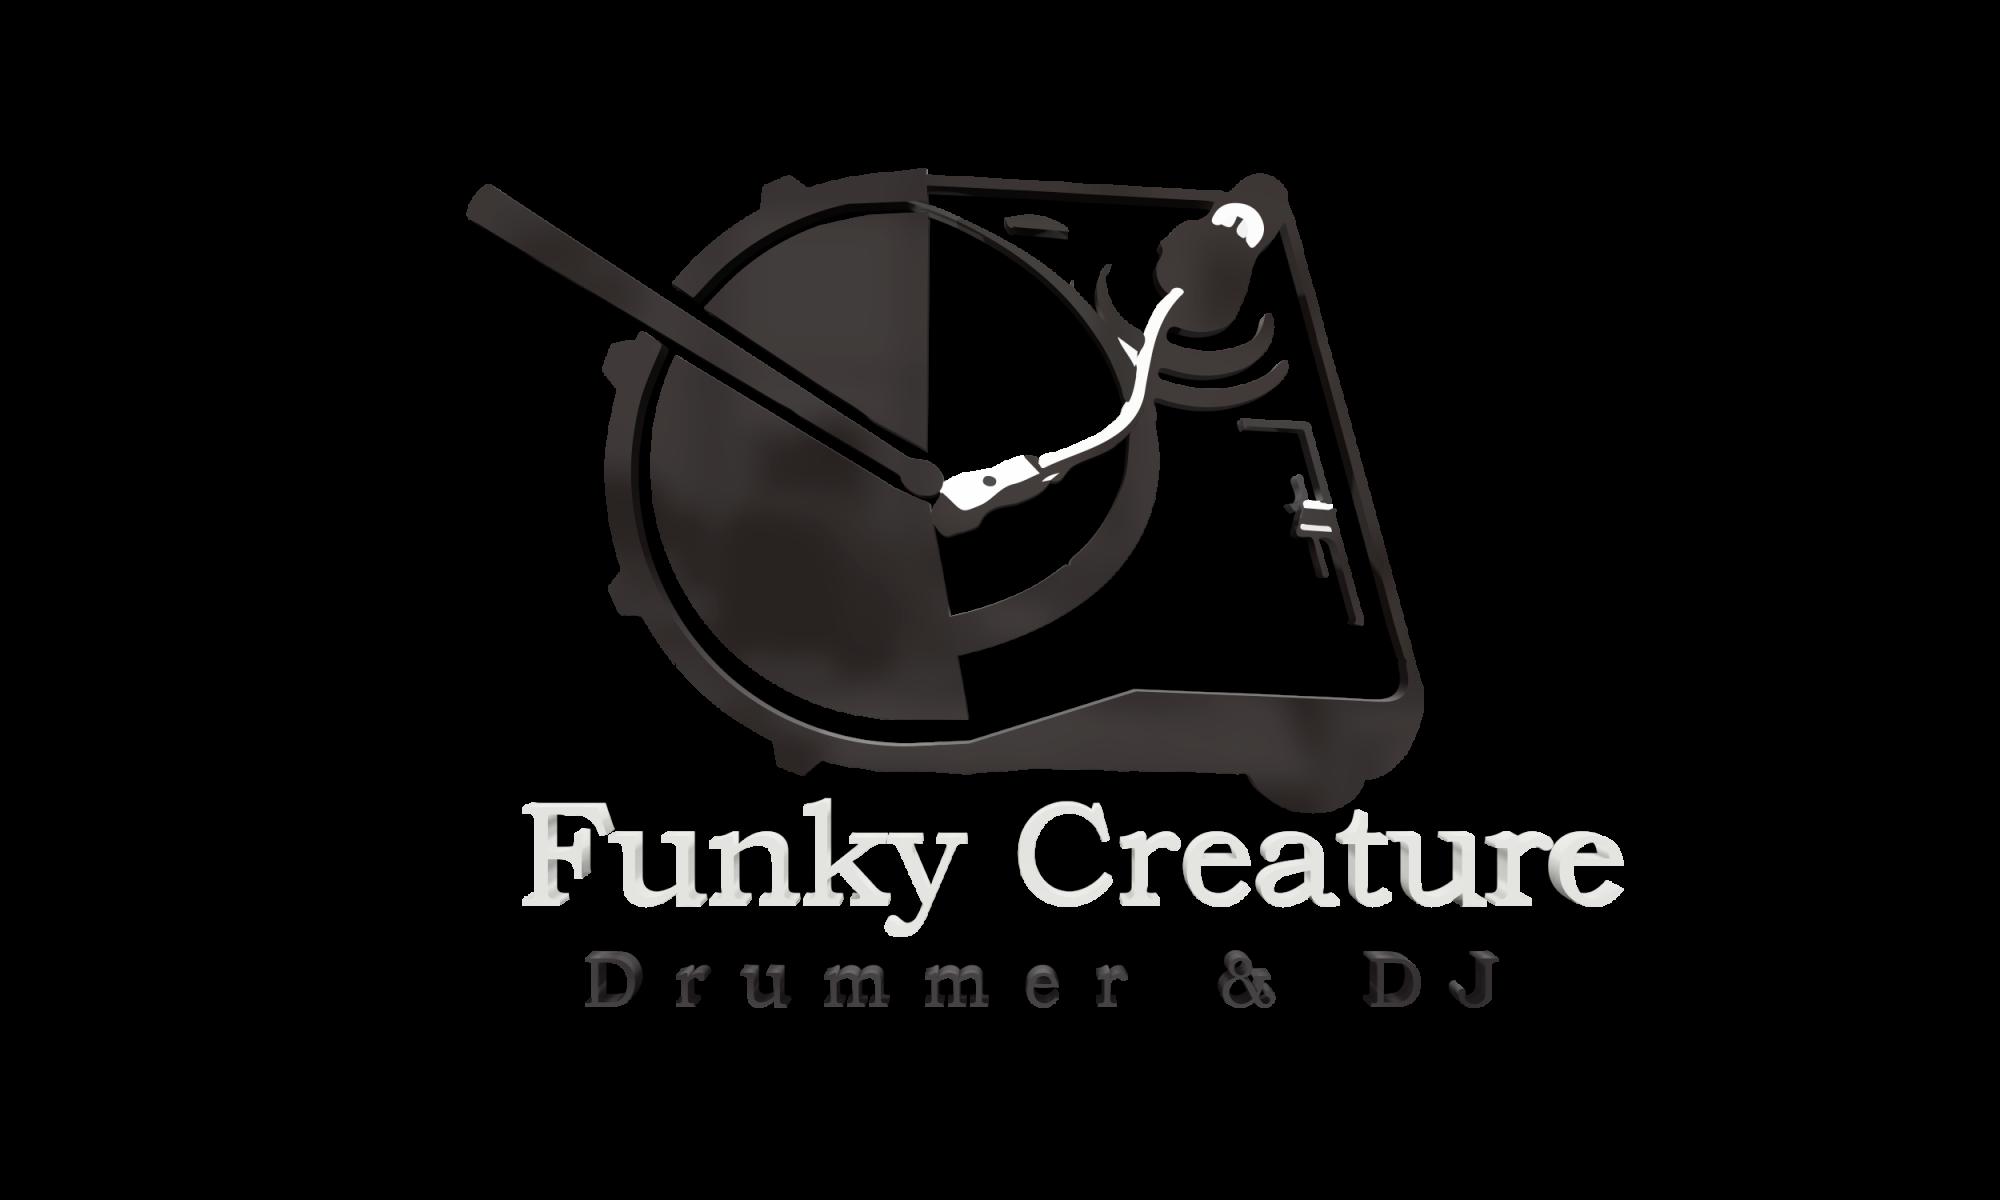 Funky Creature